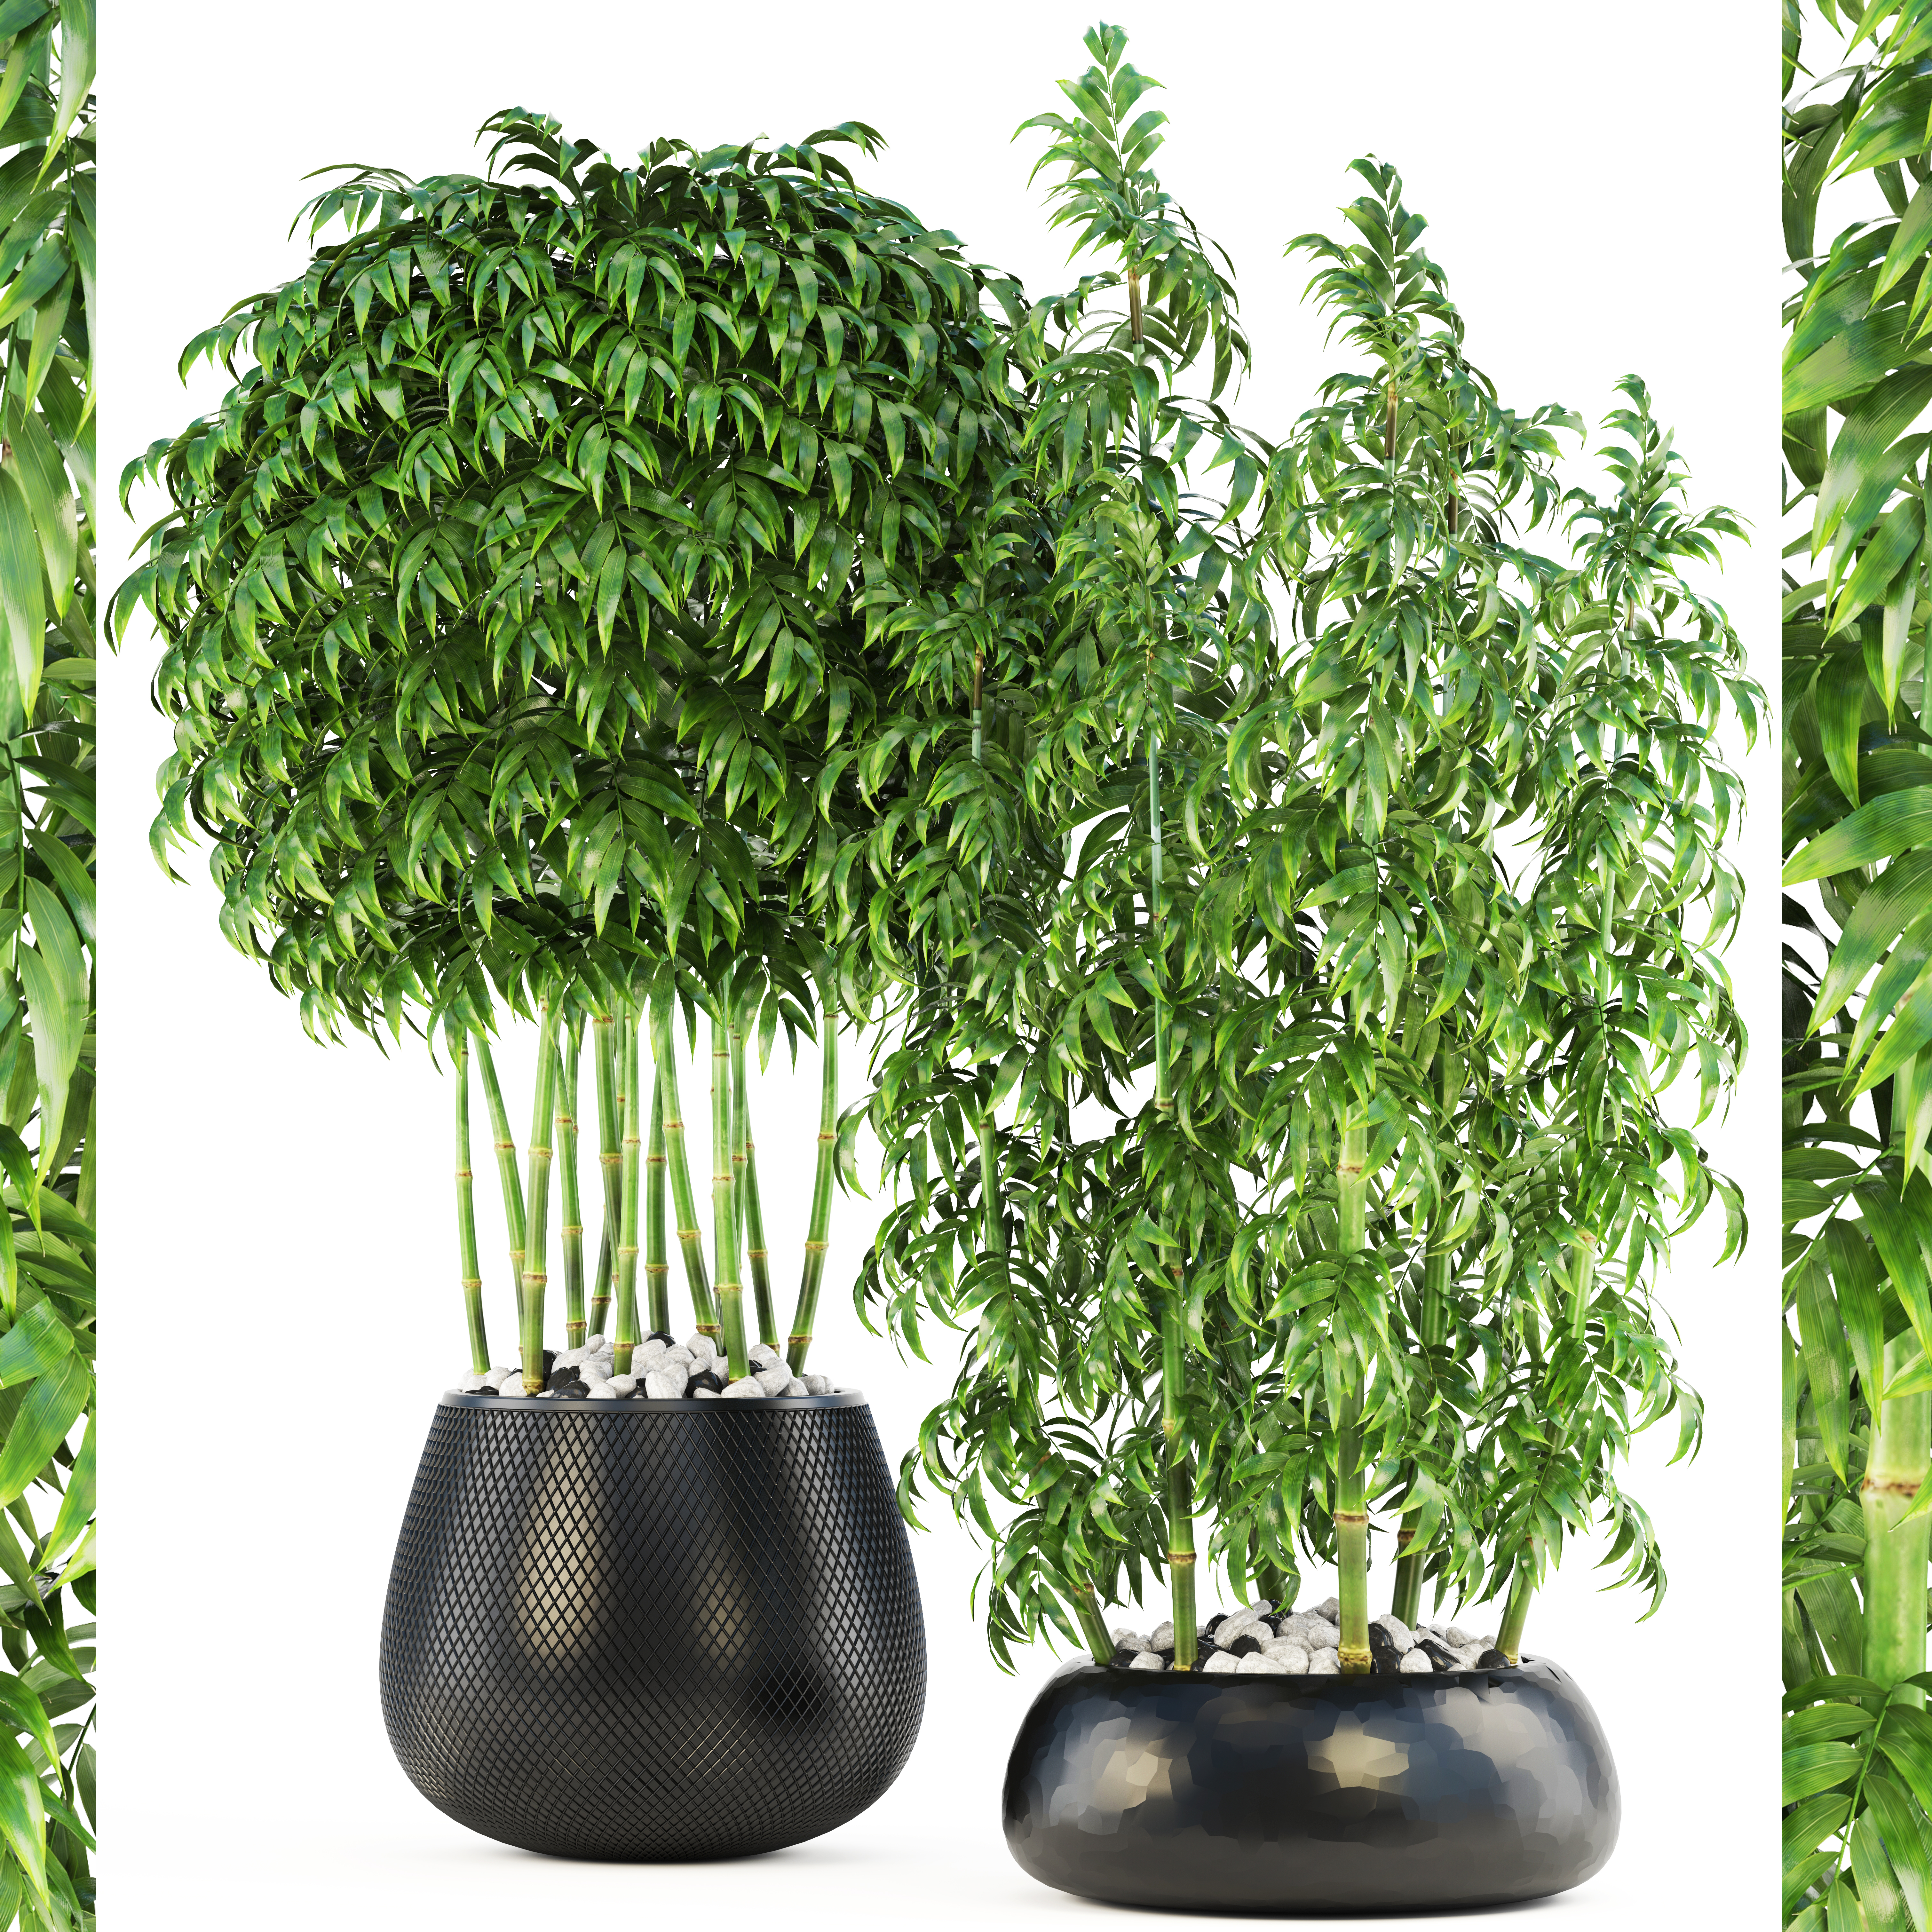 Bamboo Trees 3d Model Turbosquid 1229120